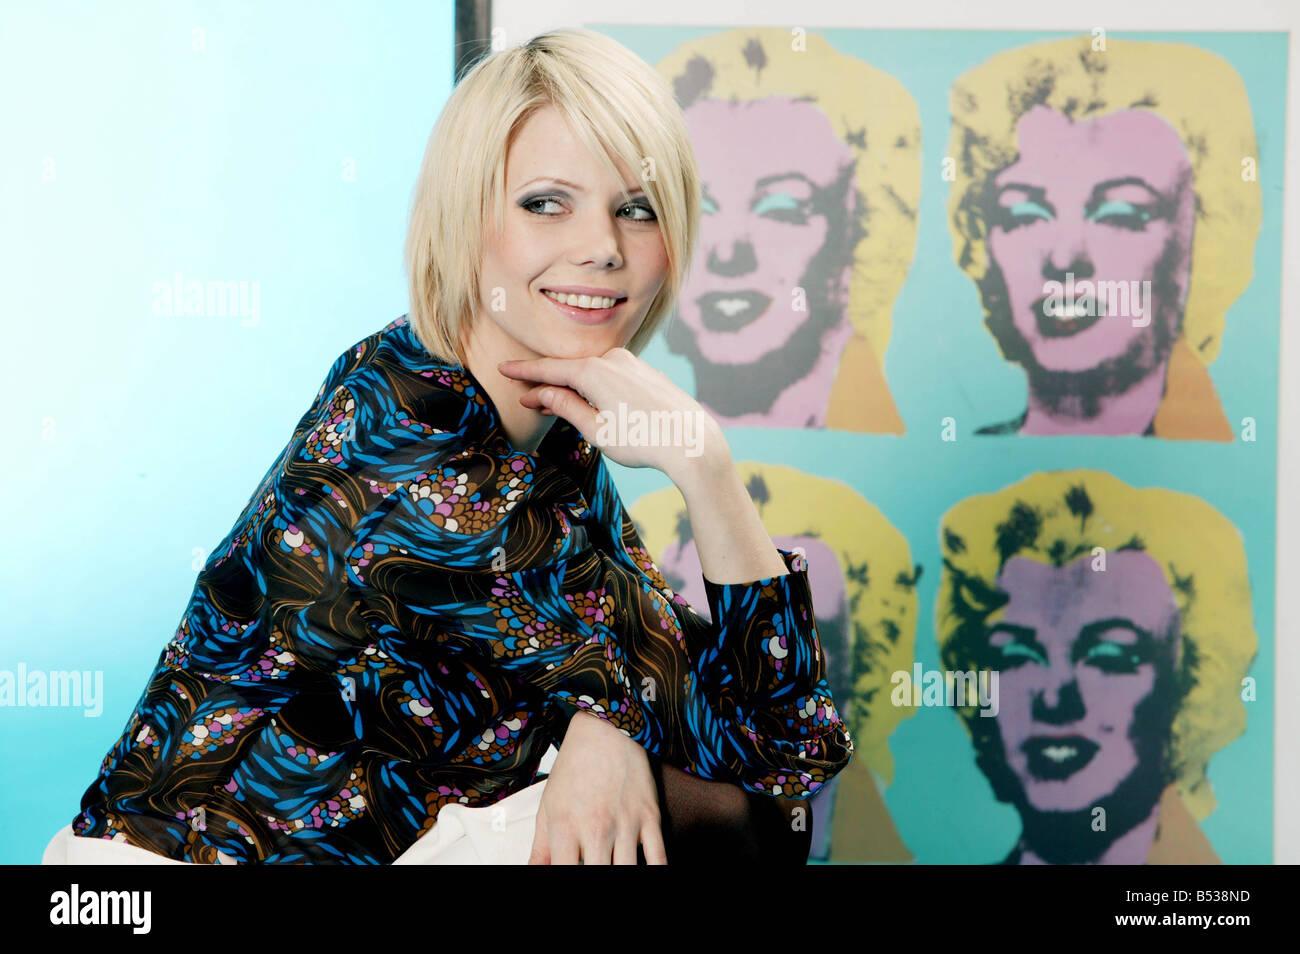 Andy Warhol cortometraggi